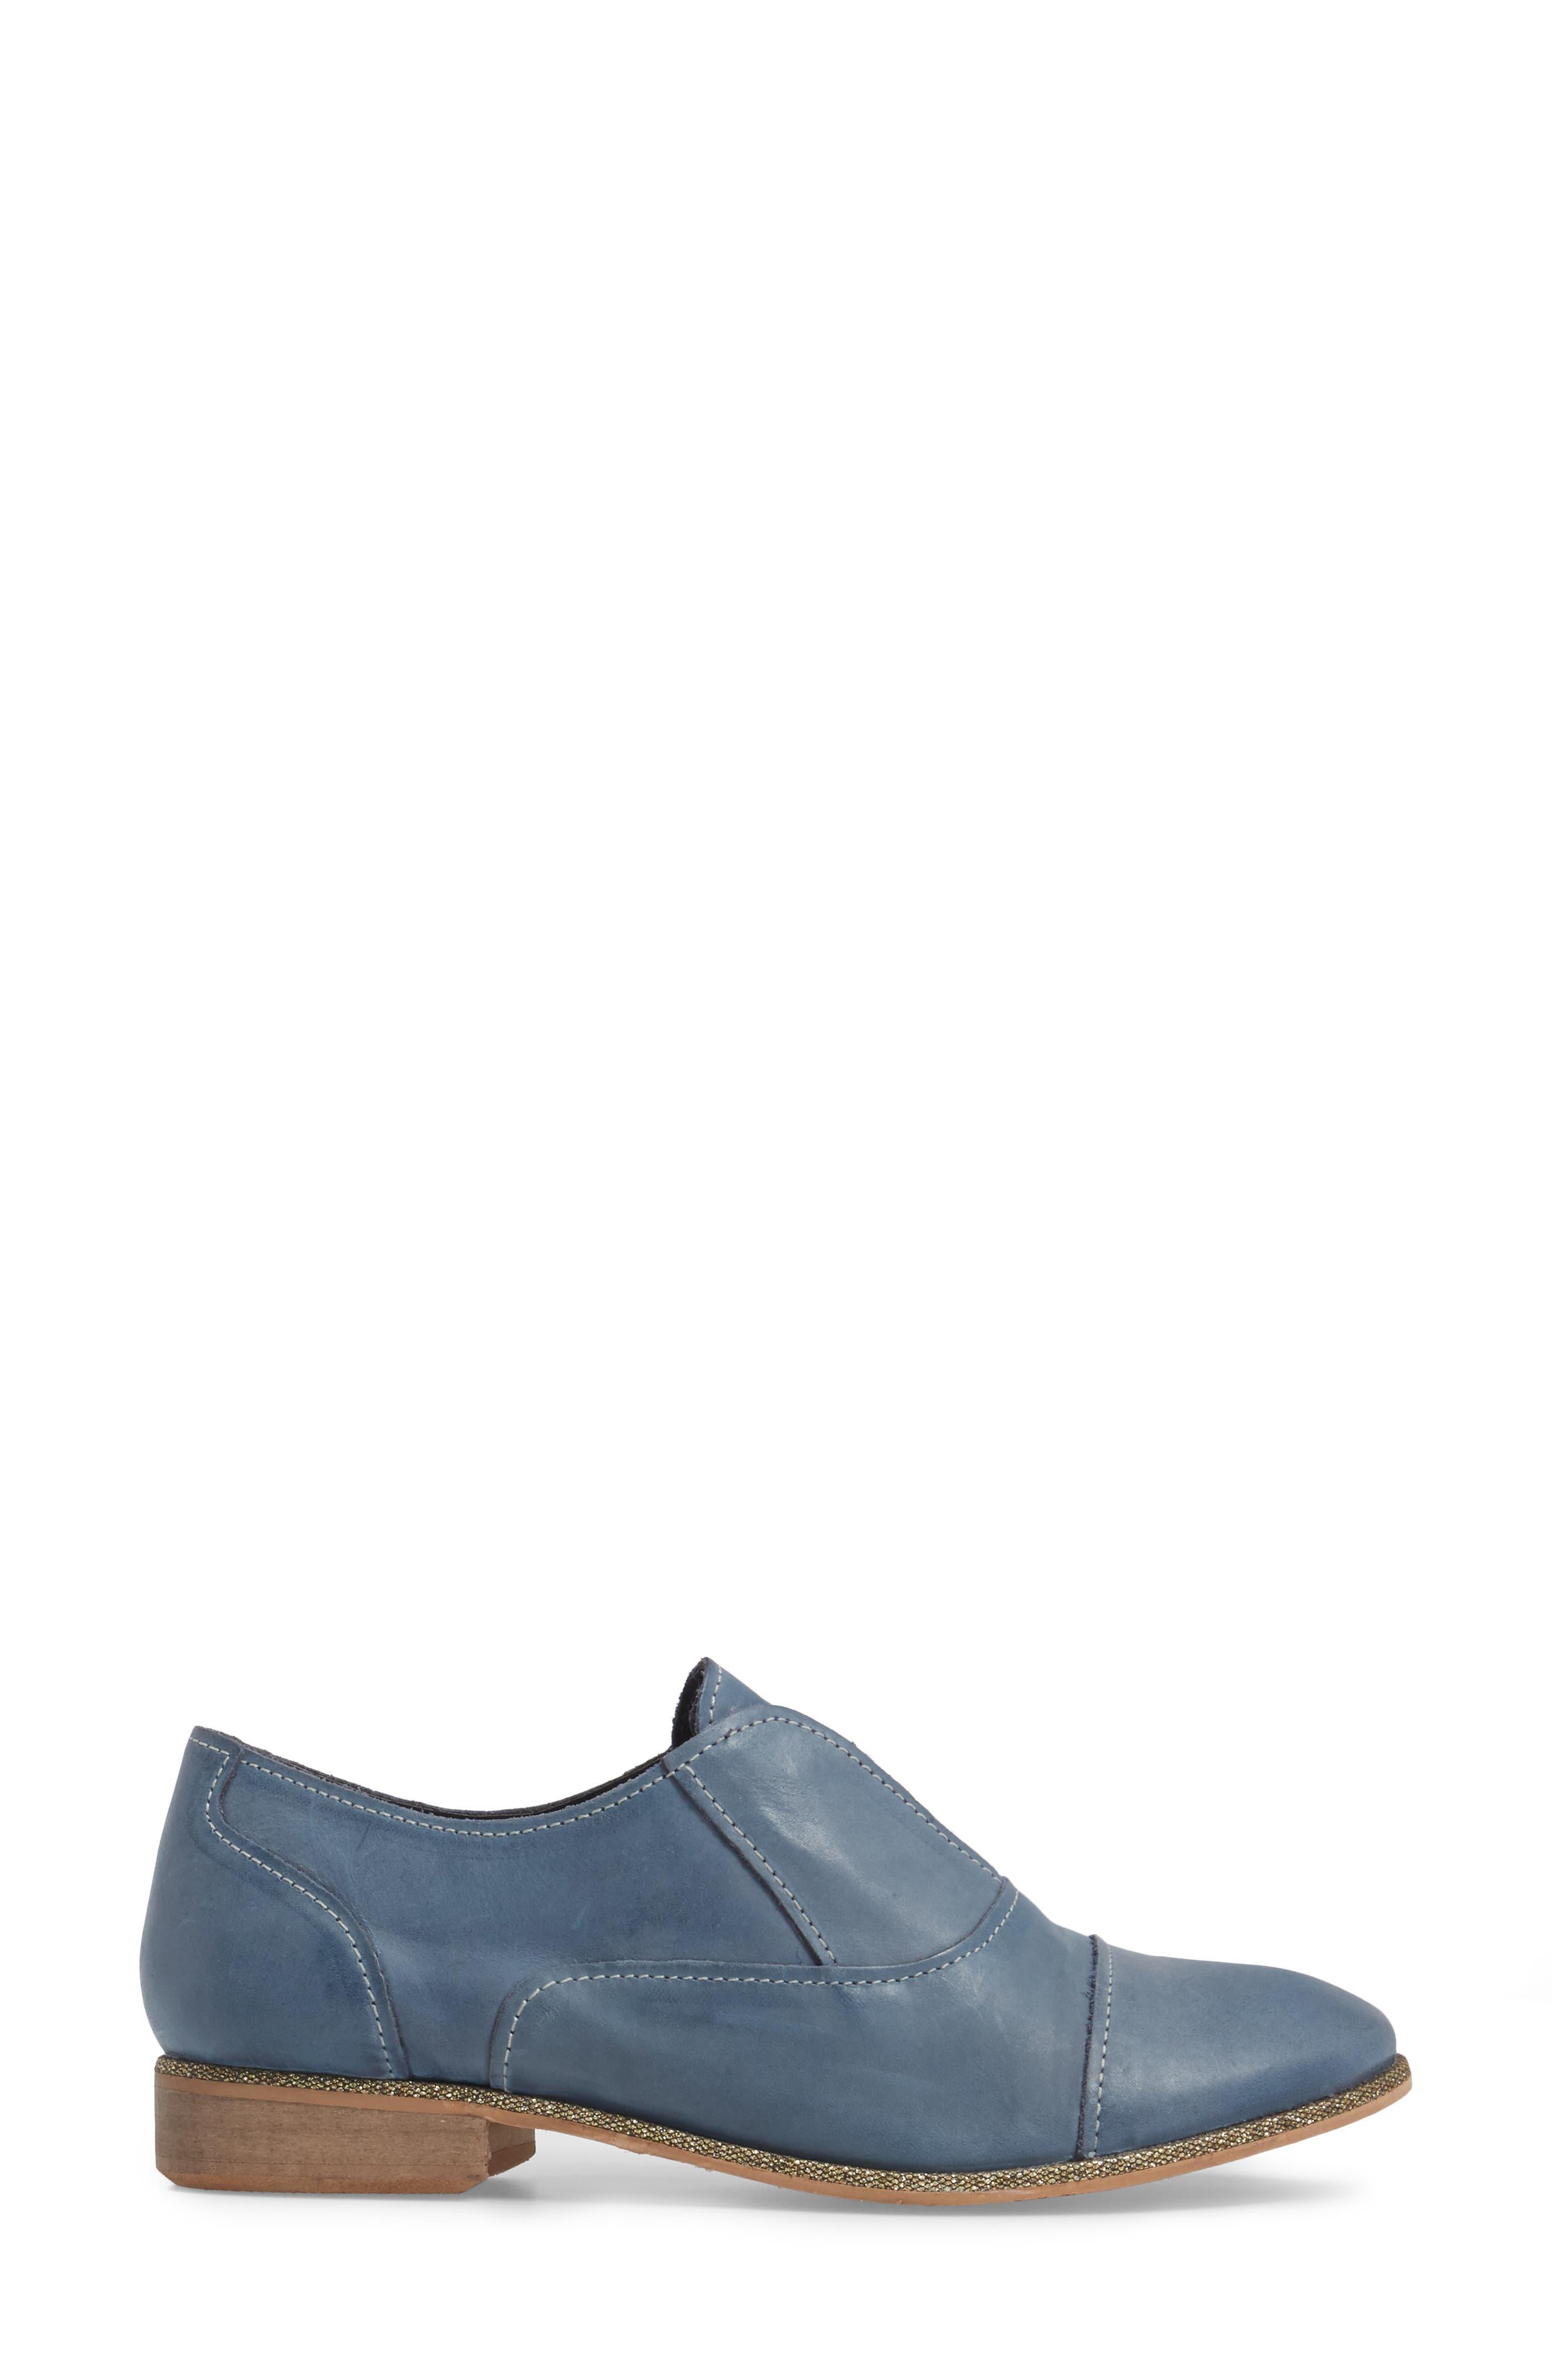 Slip Knot Loafer,                             Alternate thumbnail 3, color,                             Blue Leather